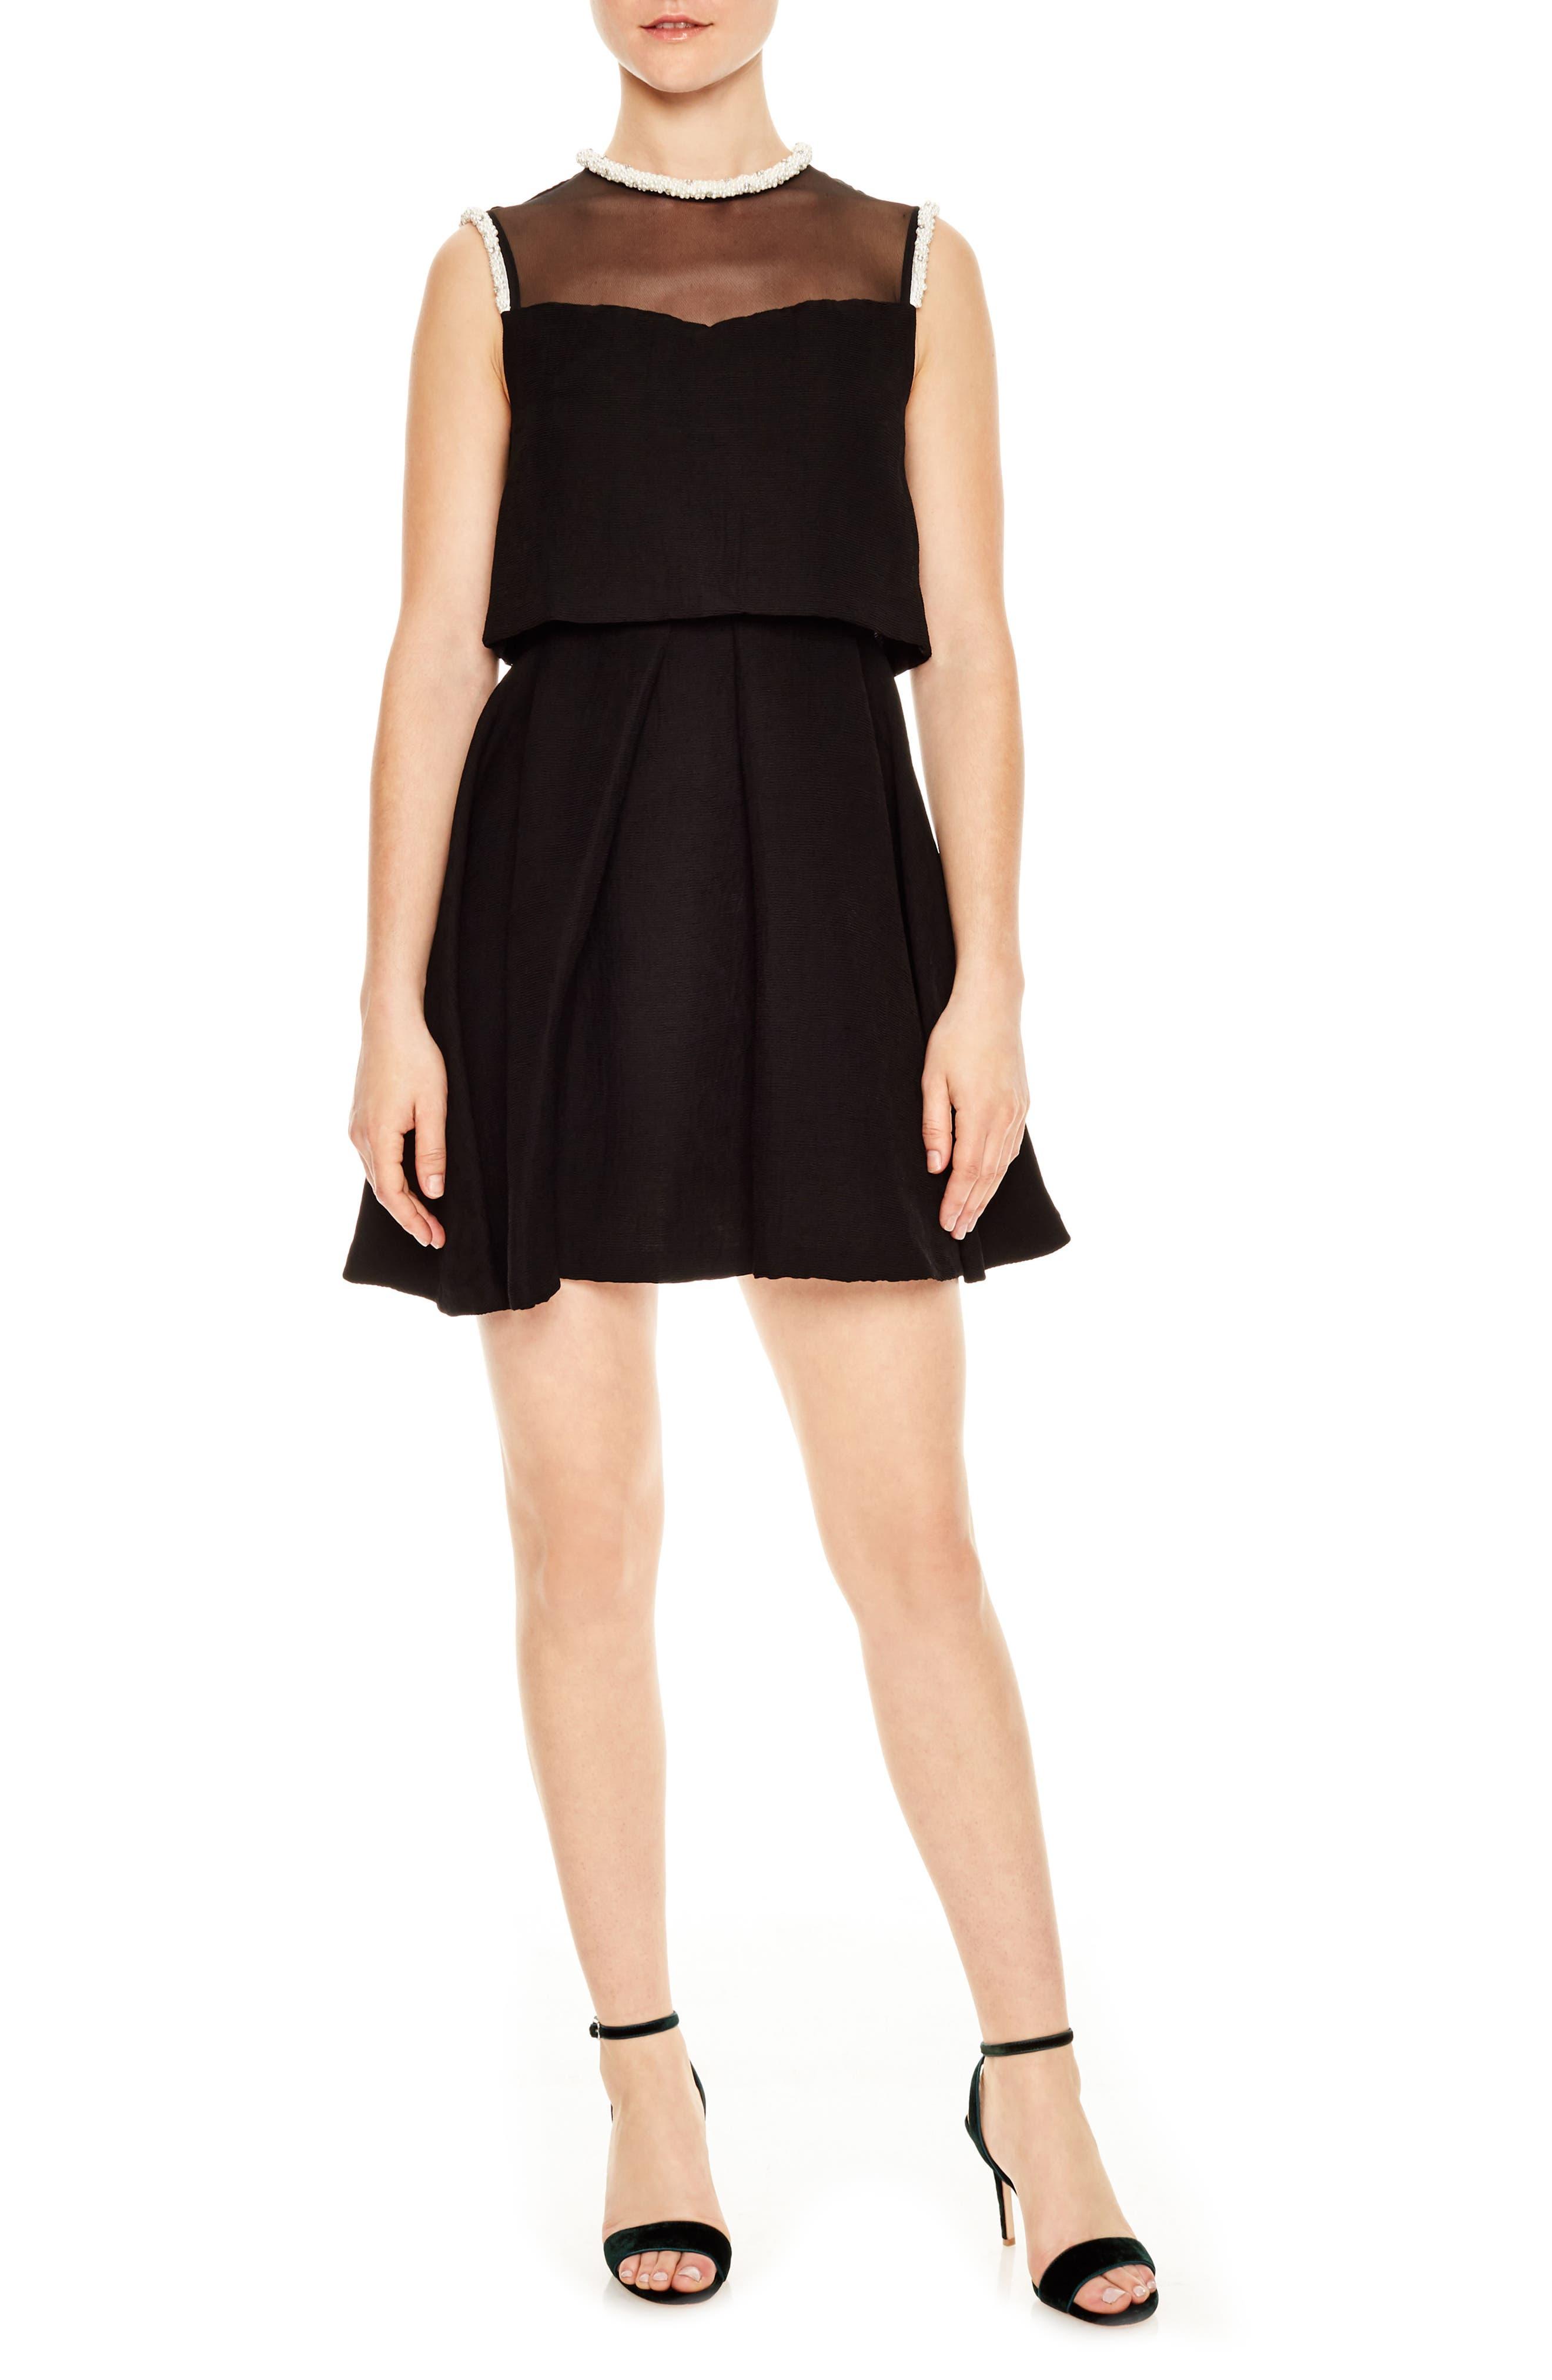 Ouma Jewel Neck Flare Dress,                         Main,                         color,